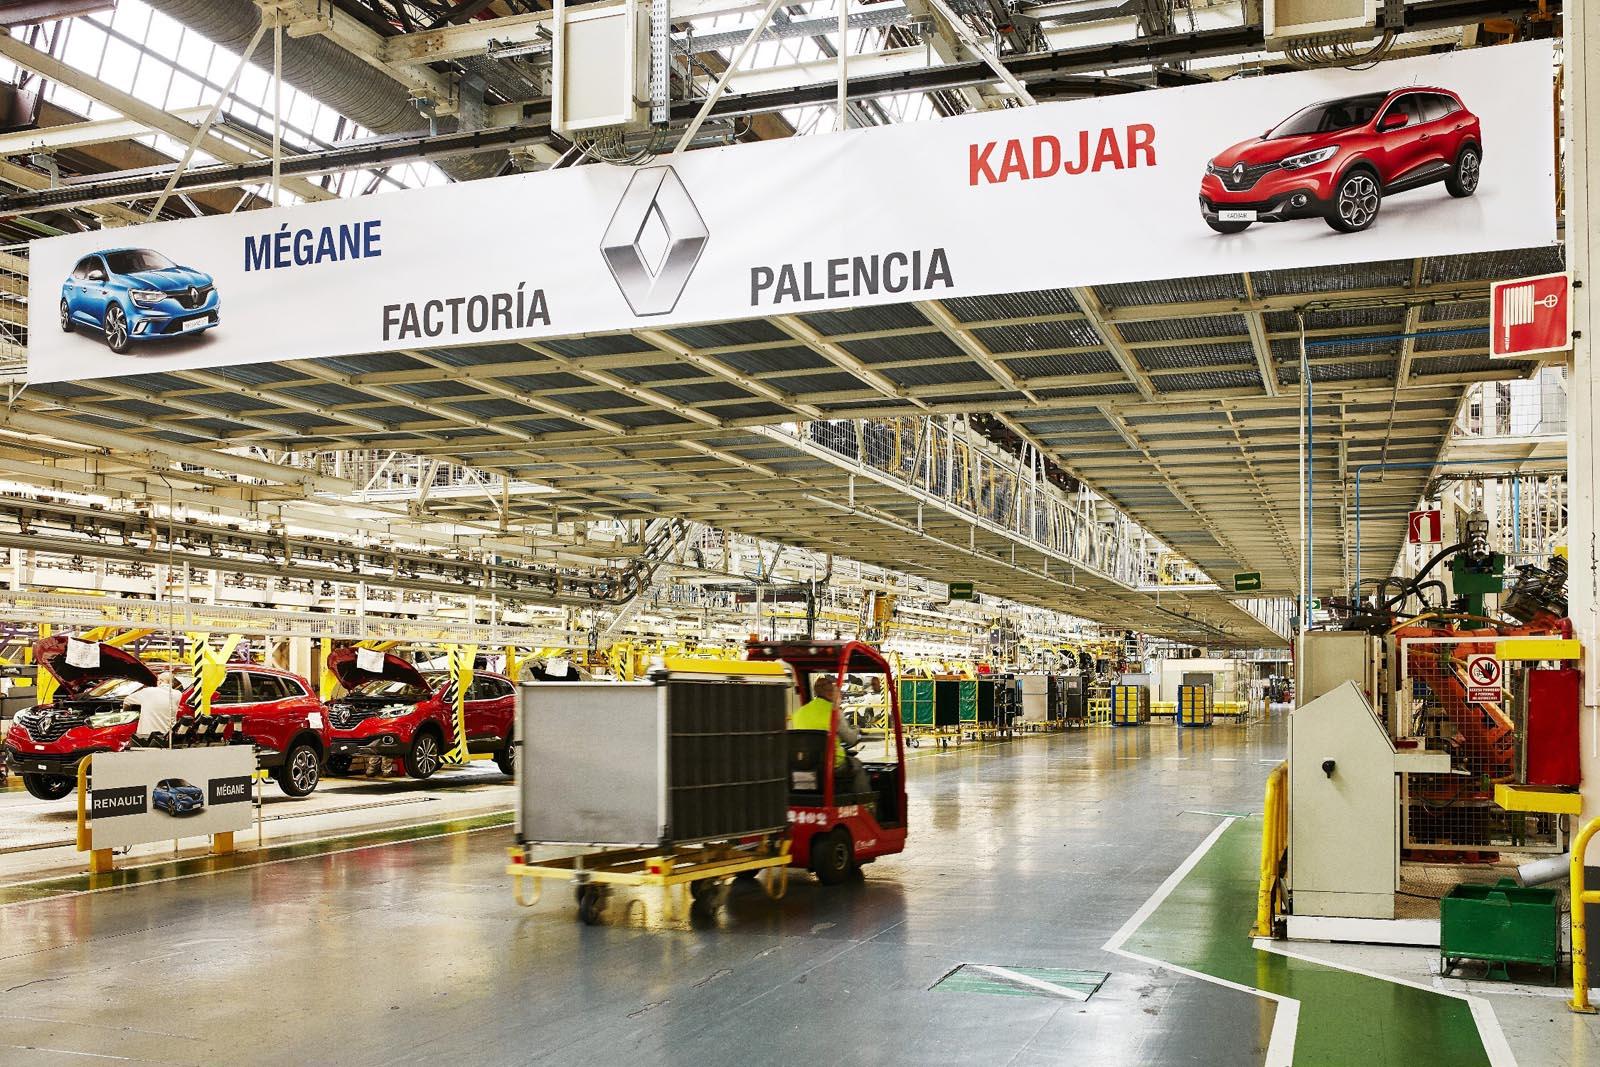 Photo of 7 εκατομμύρια οχήματα για το εργοστάσιο της Renault στην Palencia